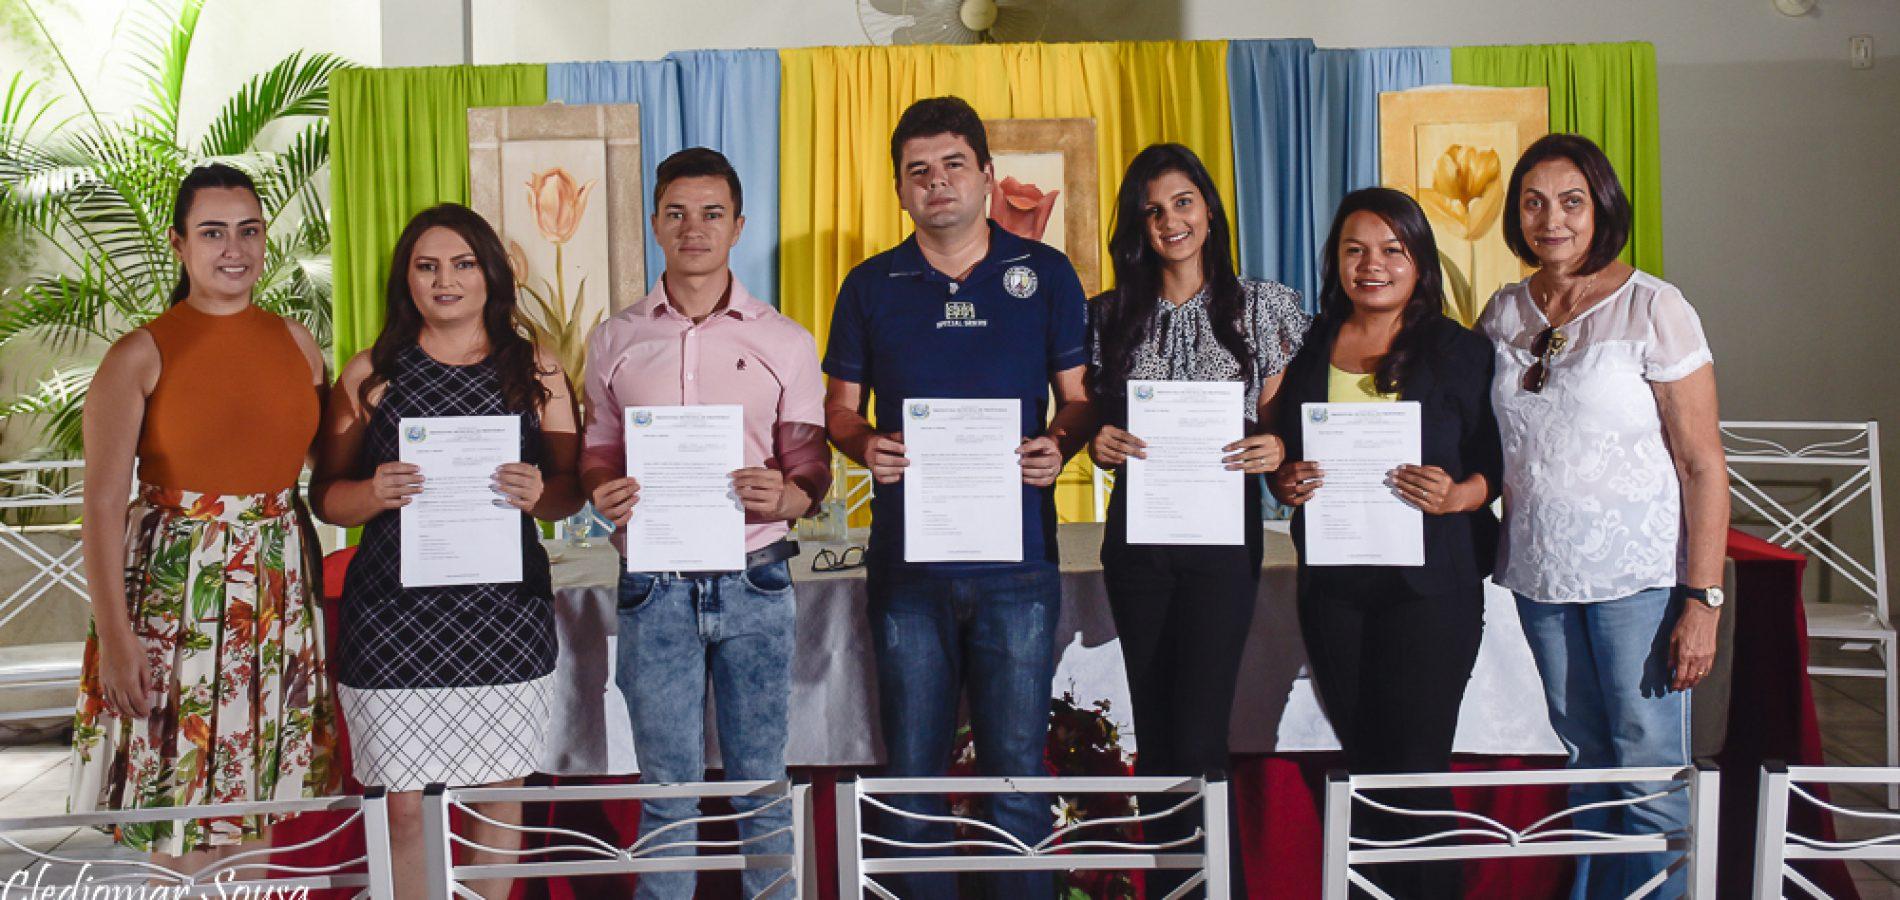 FRONTEIRAS | Prefeita Maria José empossa conselheiros tutelares